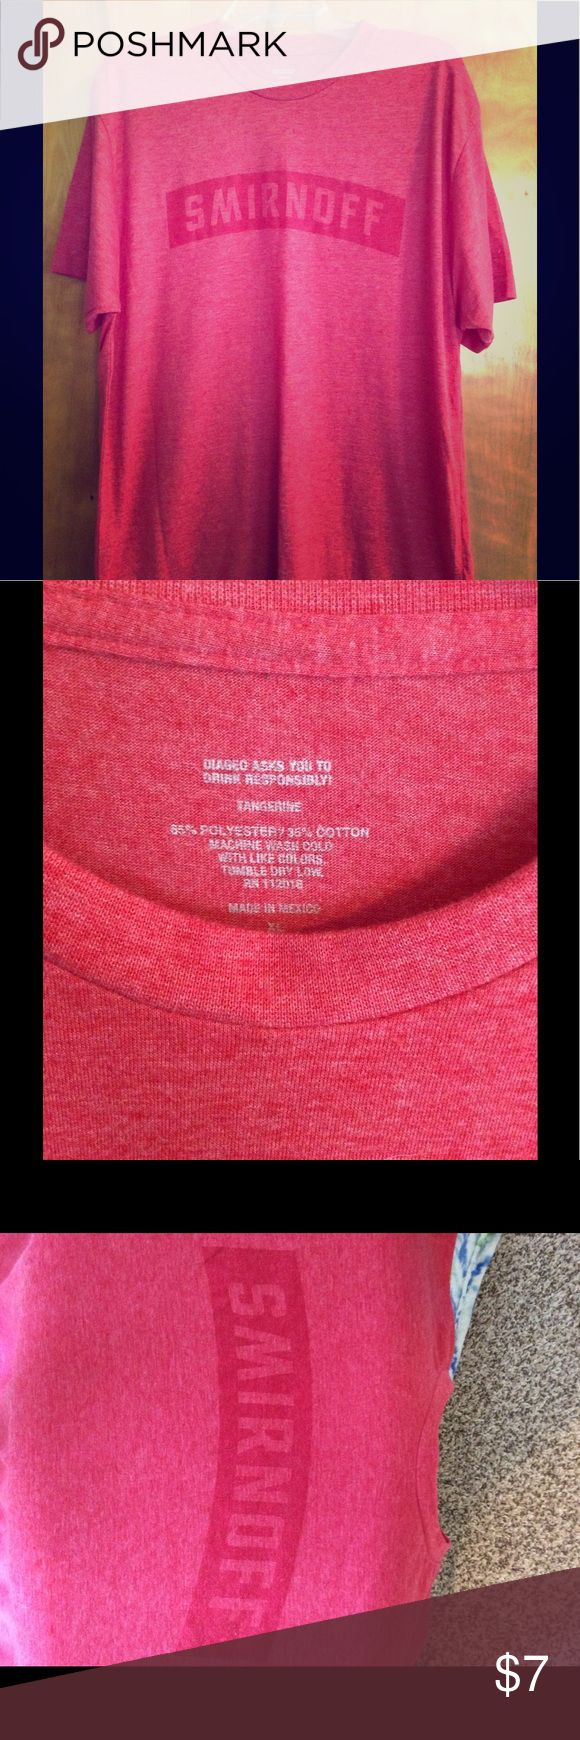 Smirnoff XL soft tshirt new Brand new liquor brand Smirnoff red super soft t shirt XL smirnoff Tops Tees - Short Sleeve